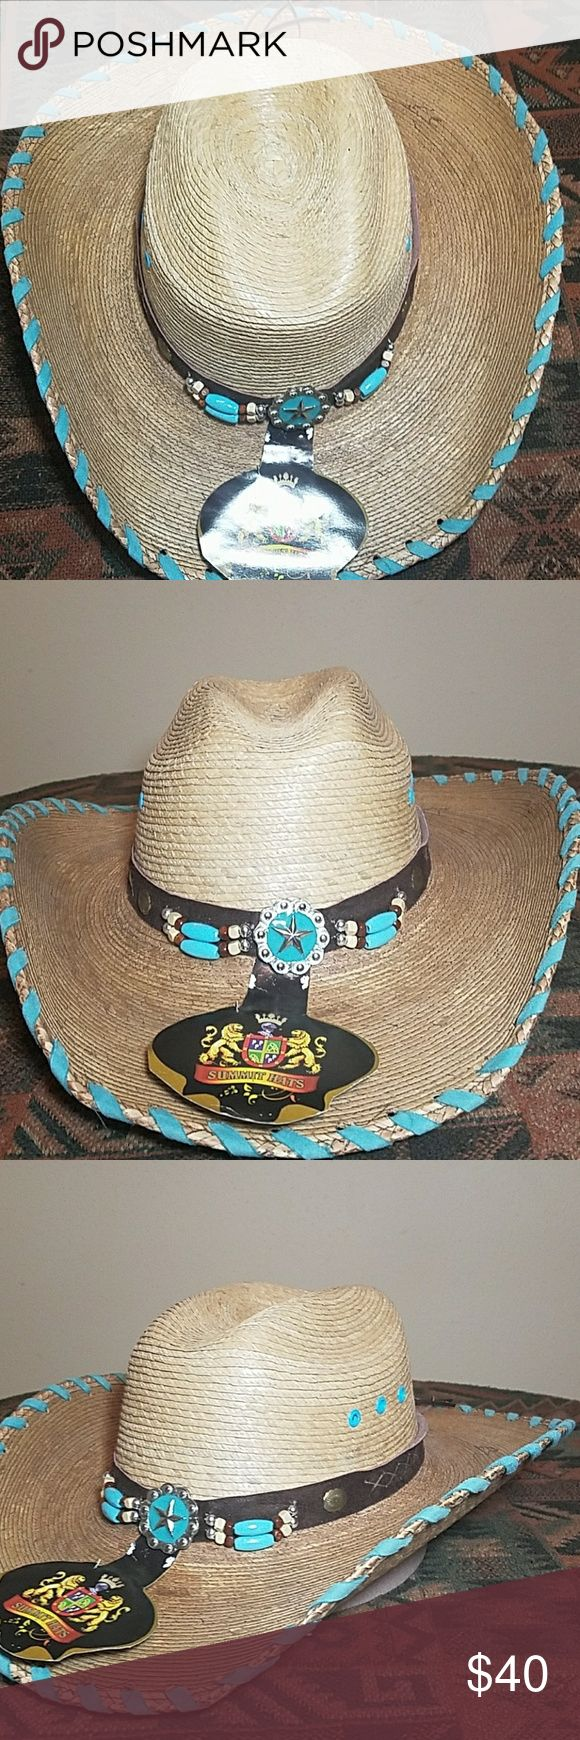 best 25+ cowboy hat bands ideas on pinterest | cowgirls, western